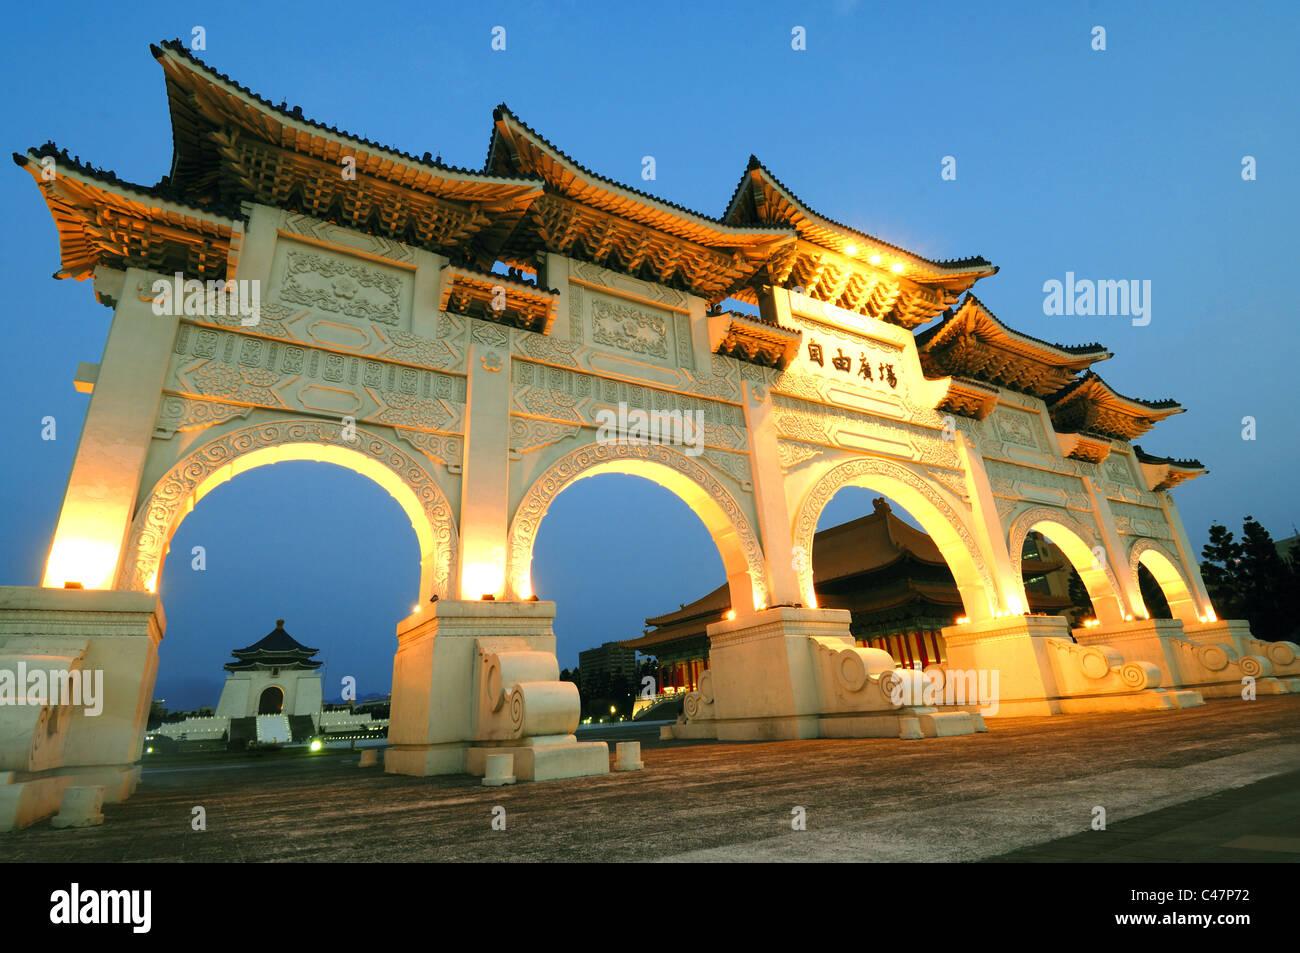 Entrance of a national monument, Chiang Kaishek Memorial Hall, Taipei, Taiwan - Stock Image